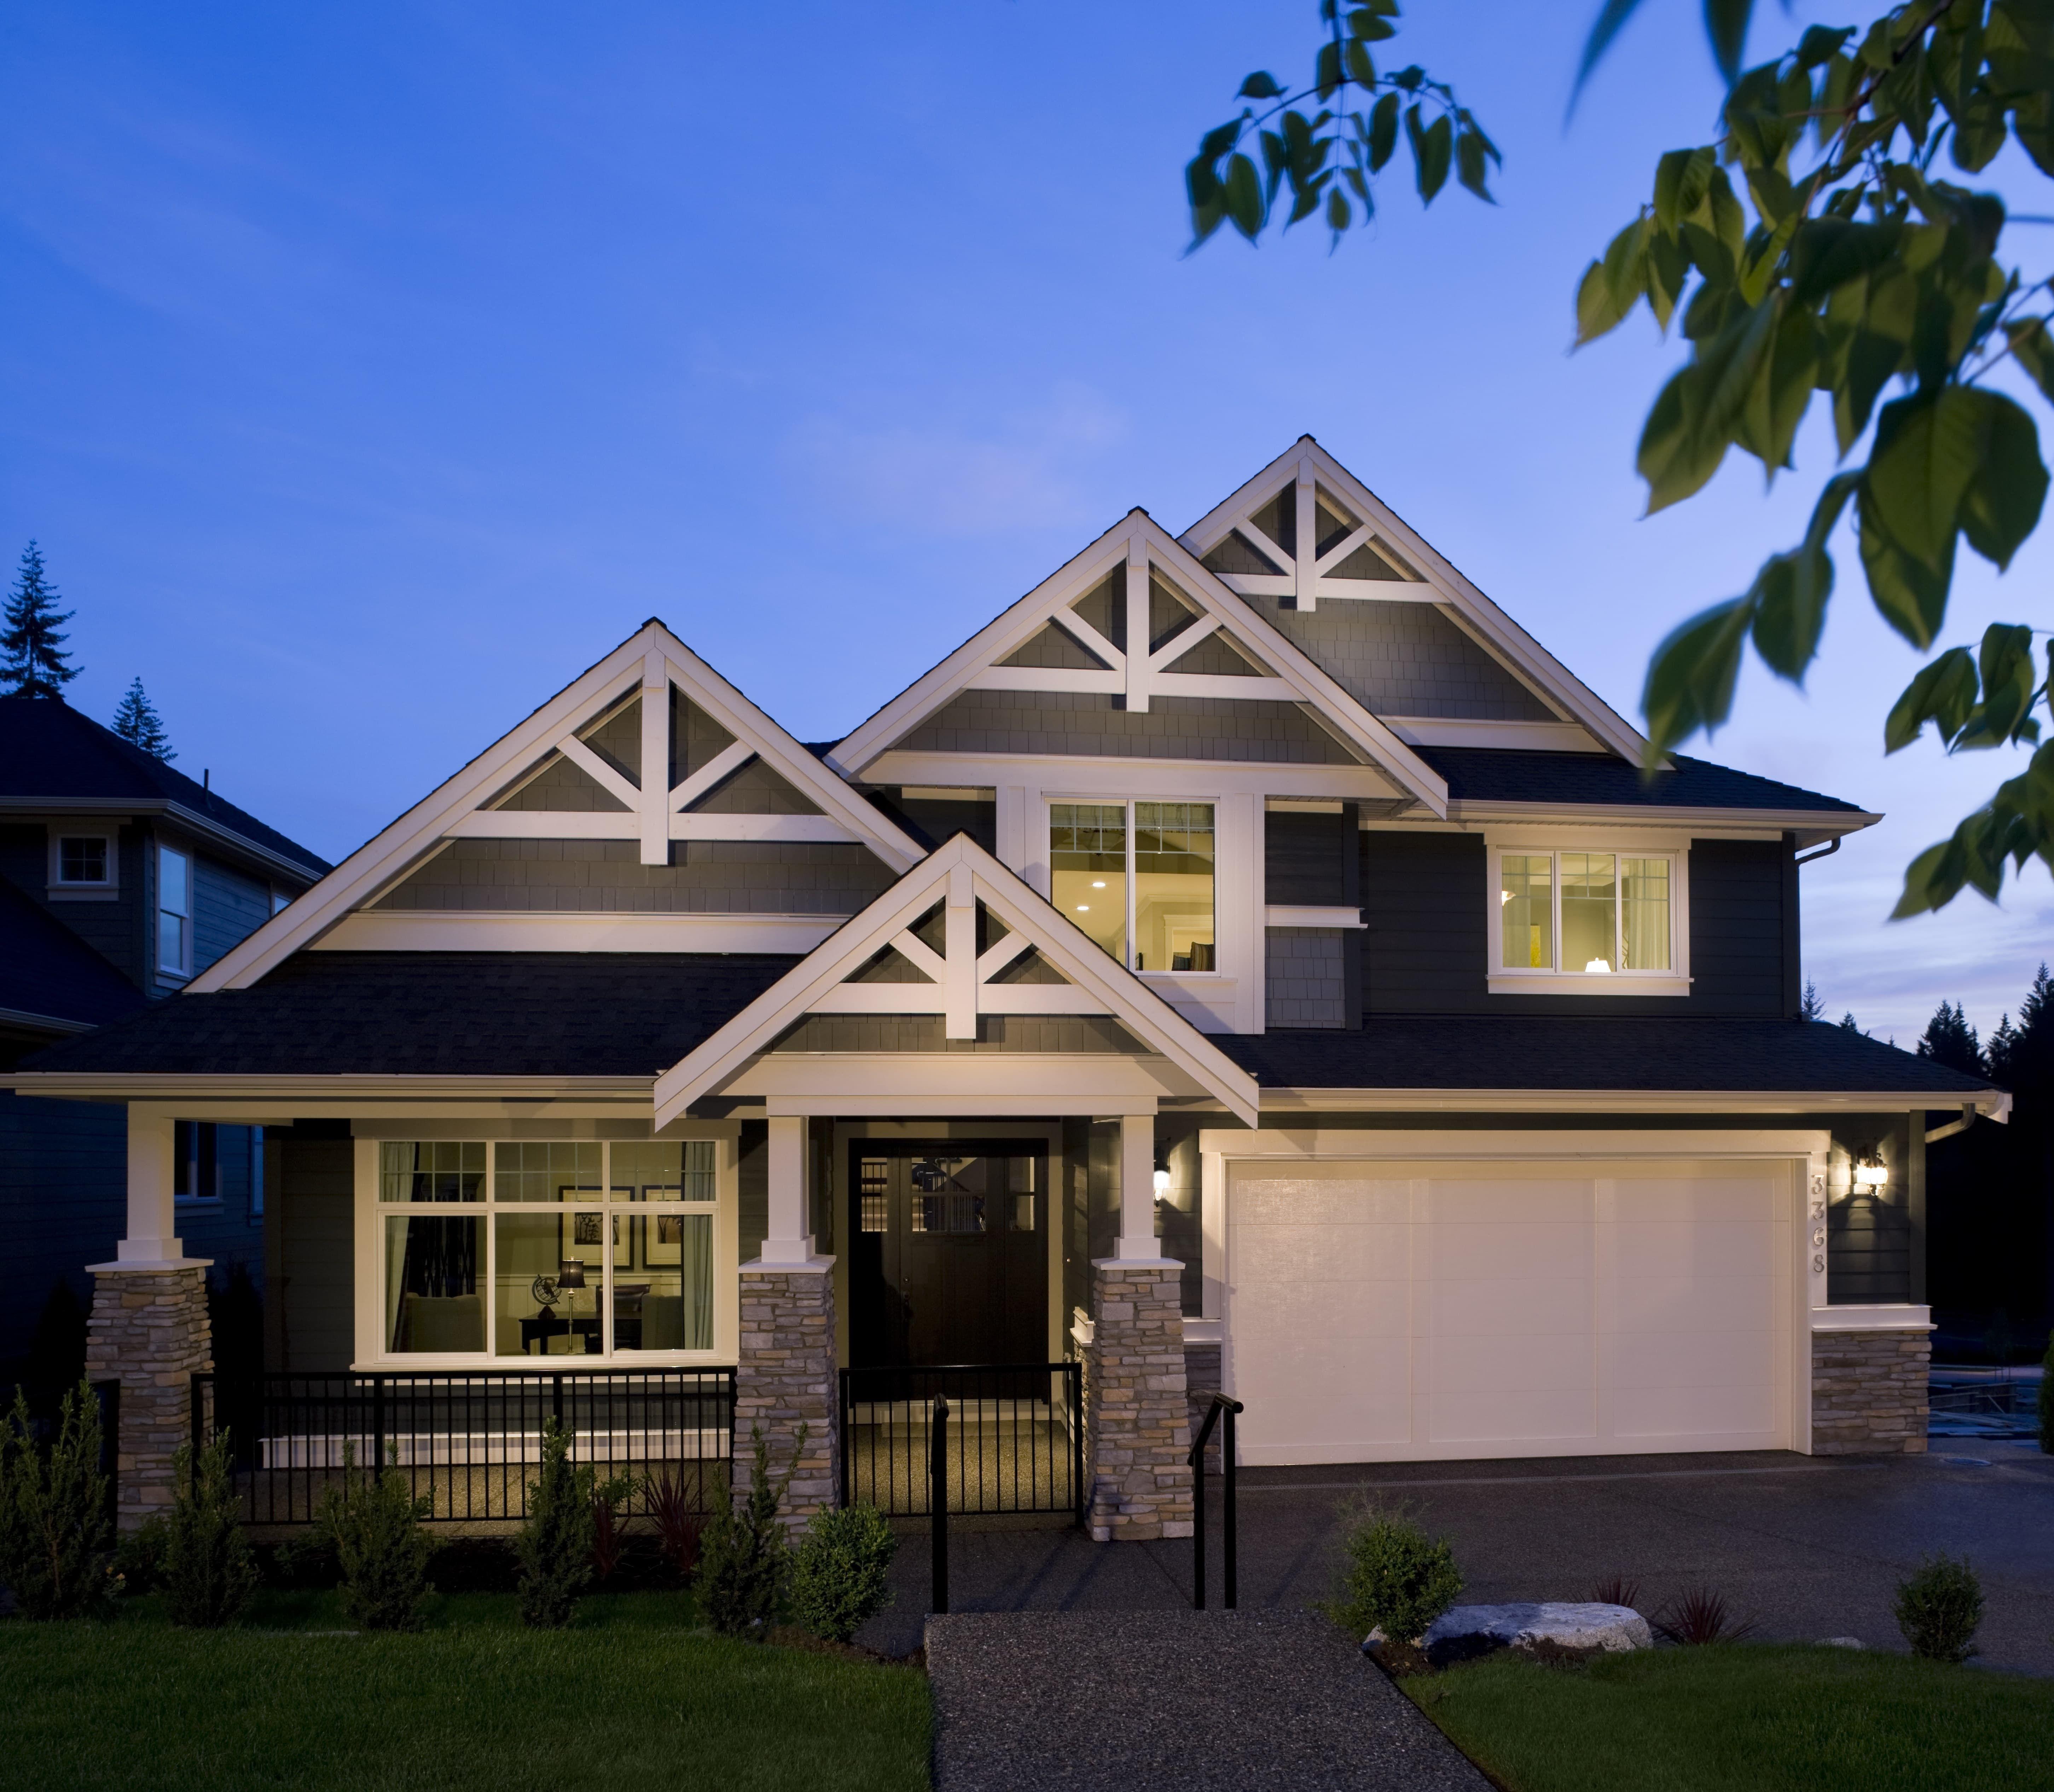 Marguerite Street, Coquitlam Custom Built Home   Ideas for the House ...